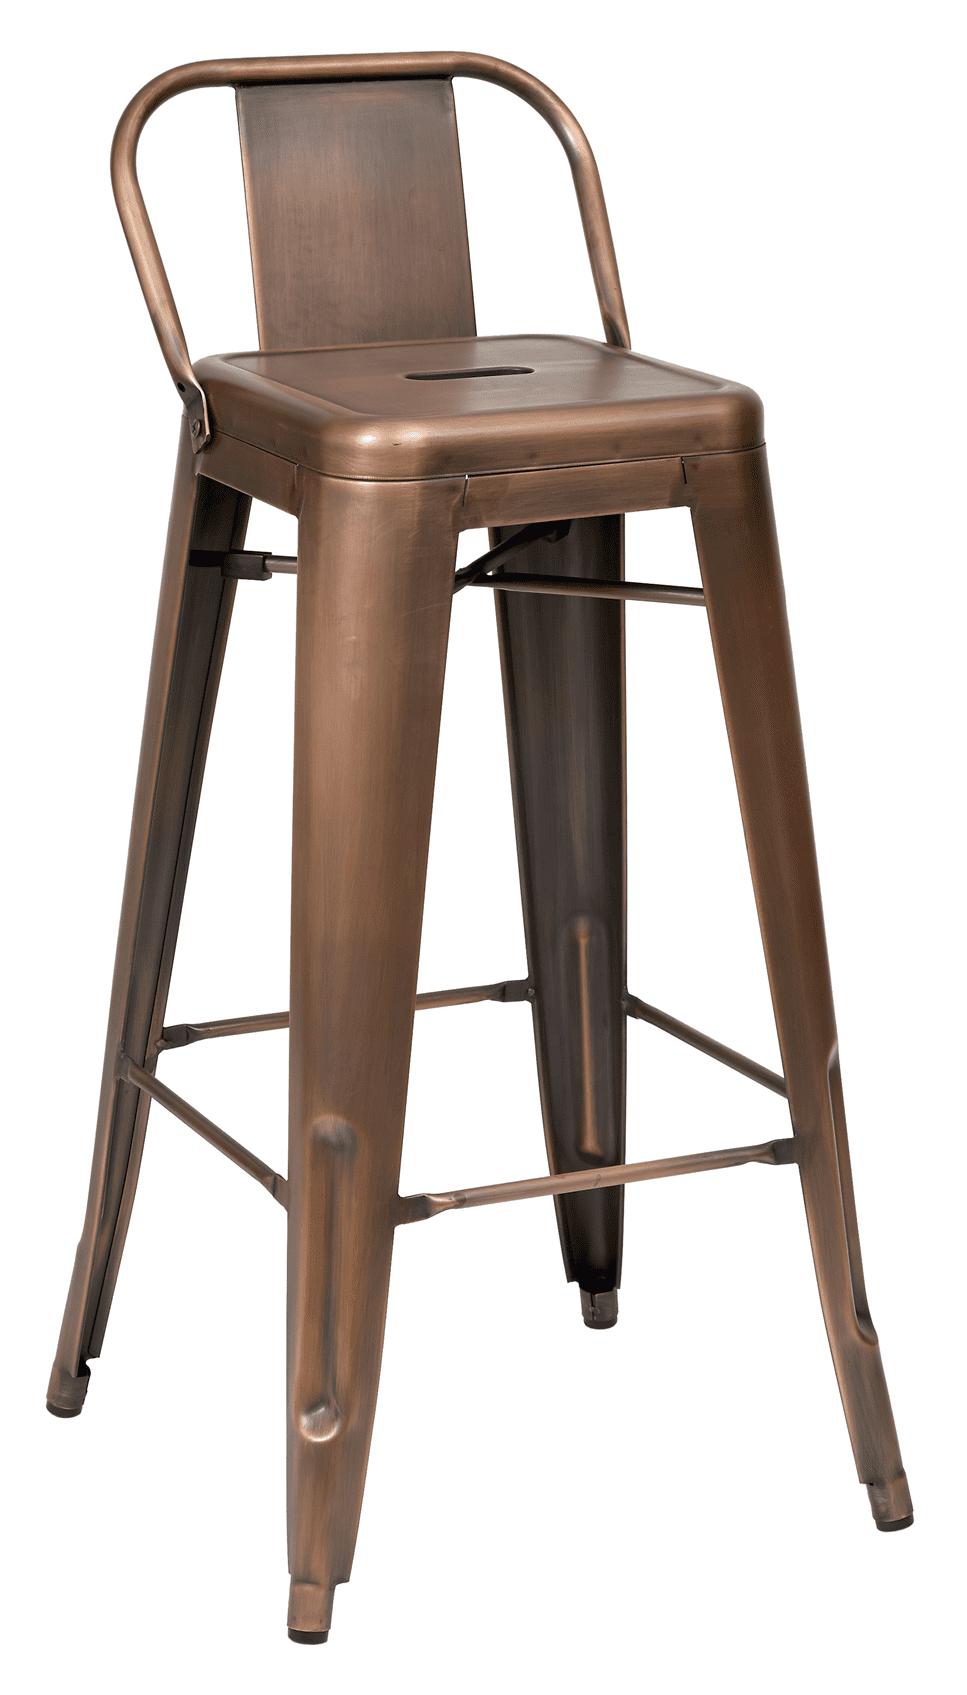 Relish bar stool